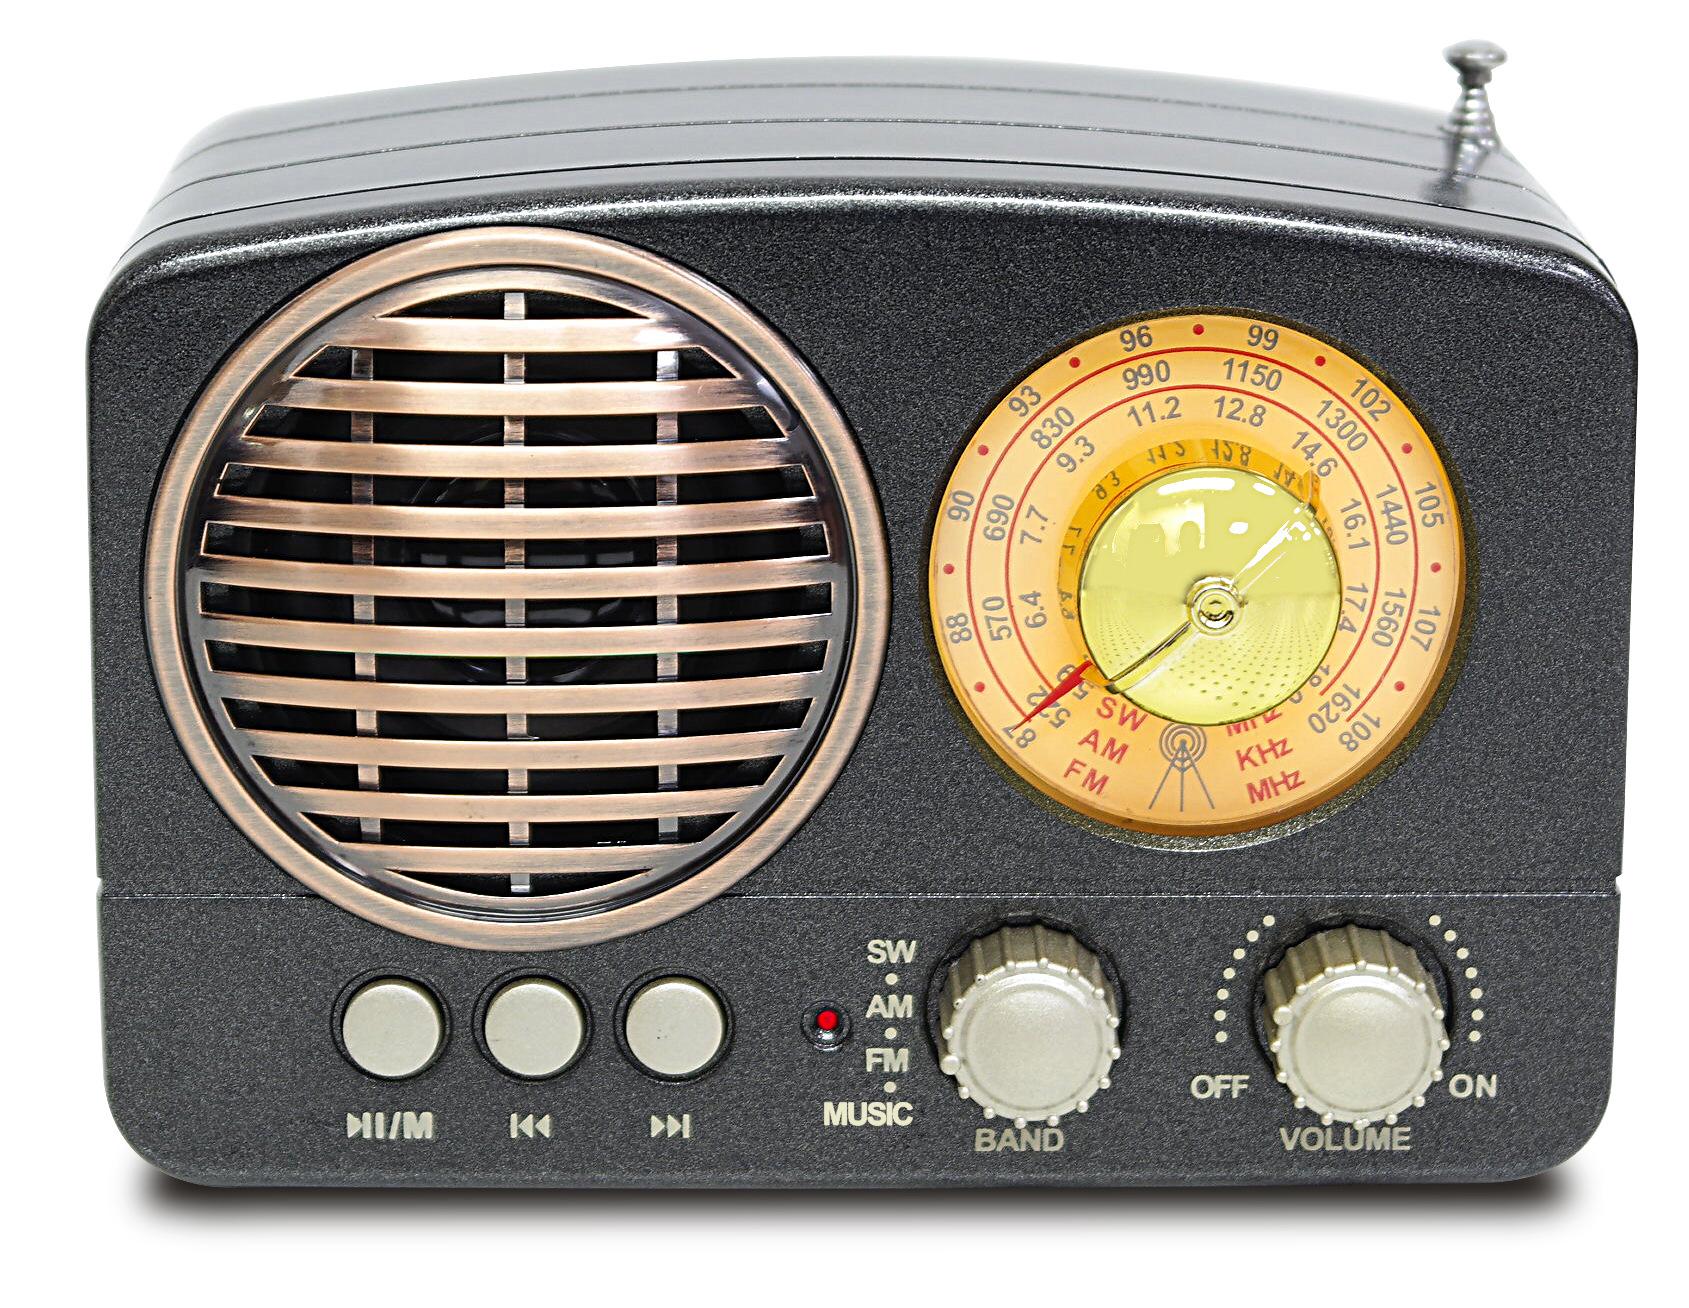 Meier Máy Radio Thương hiệu Tecsun / Desheng Model R-909